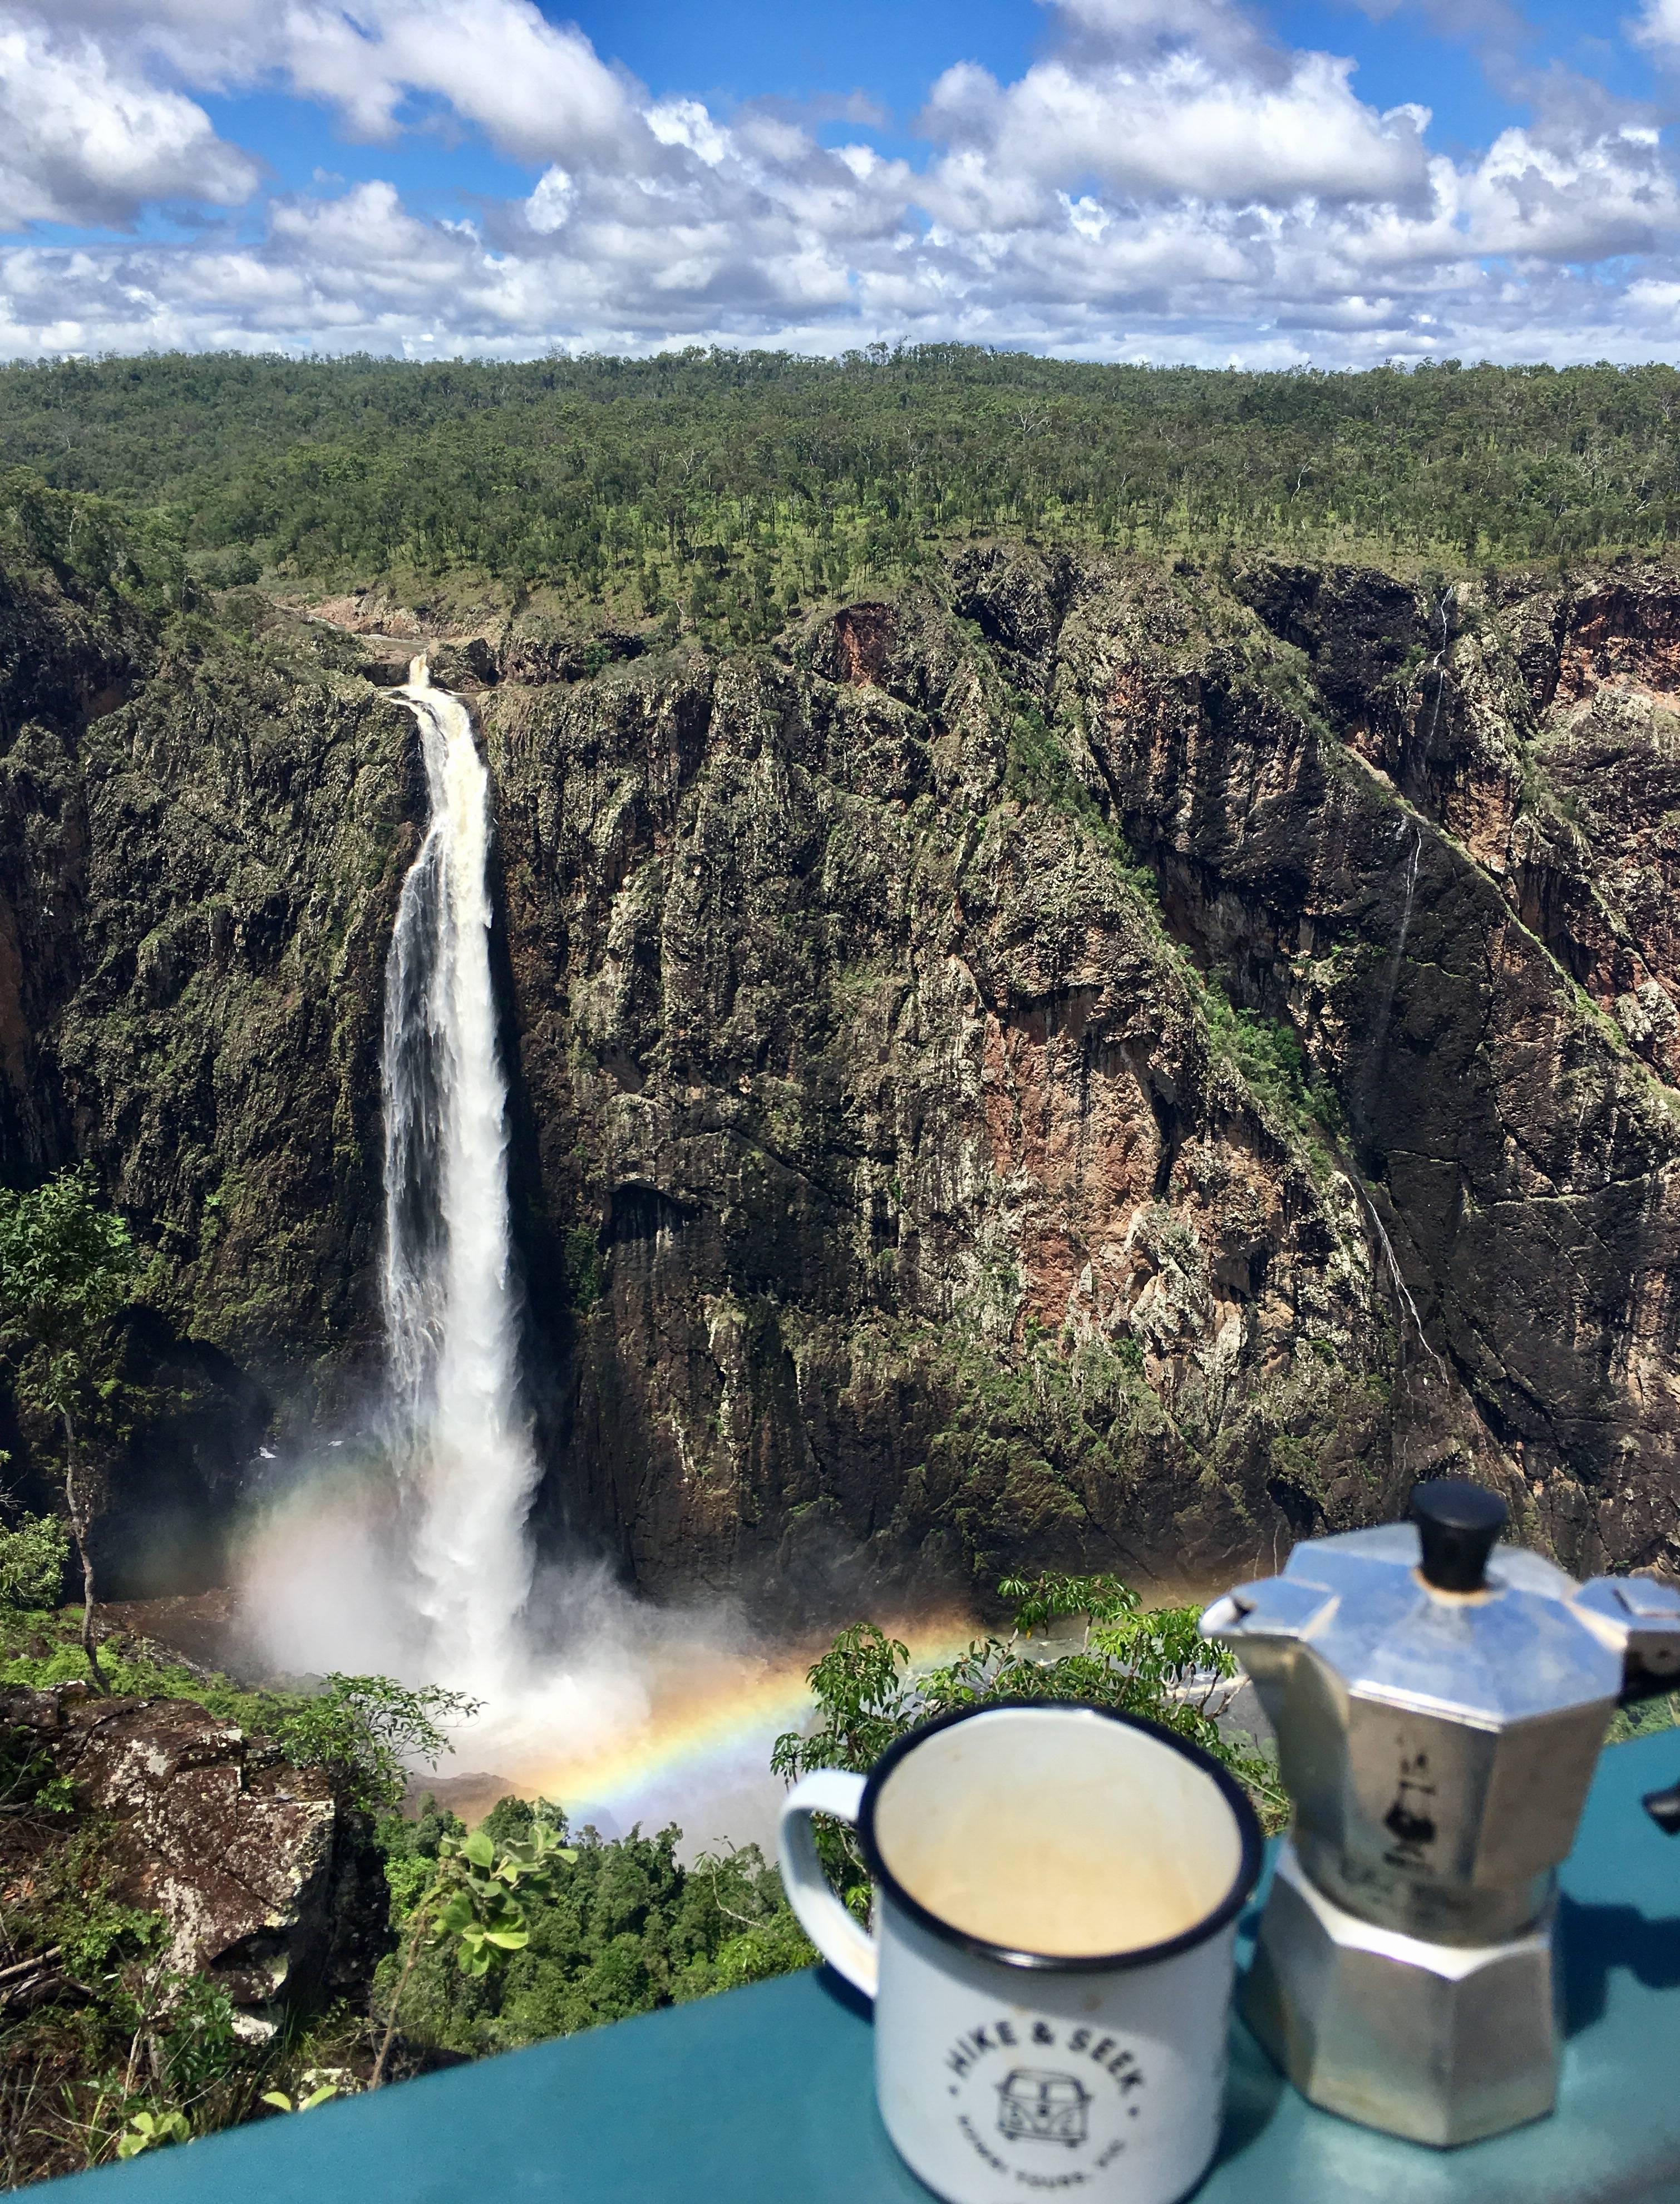 Photo 1: Wallaman falls Australia